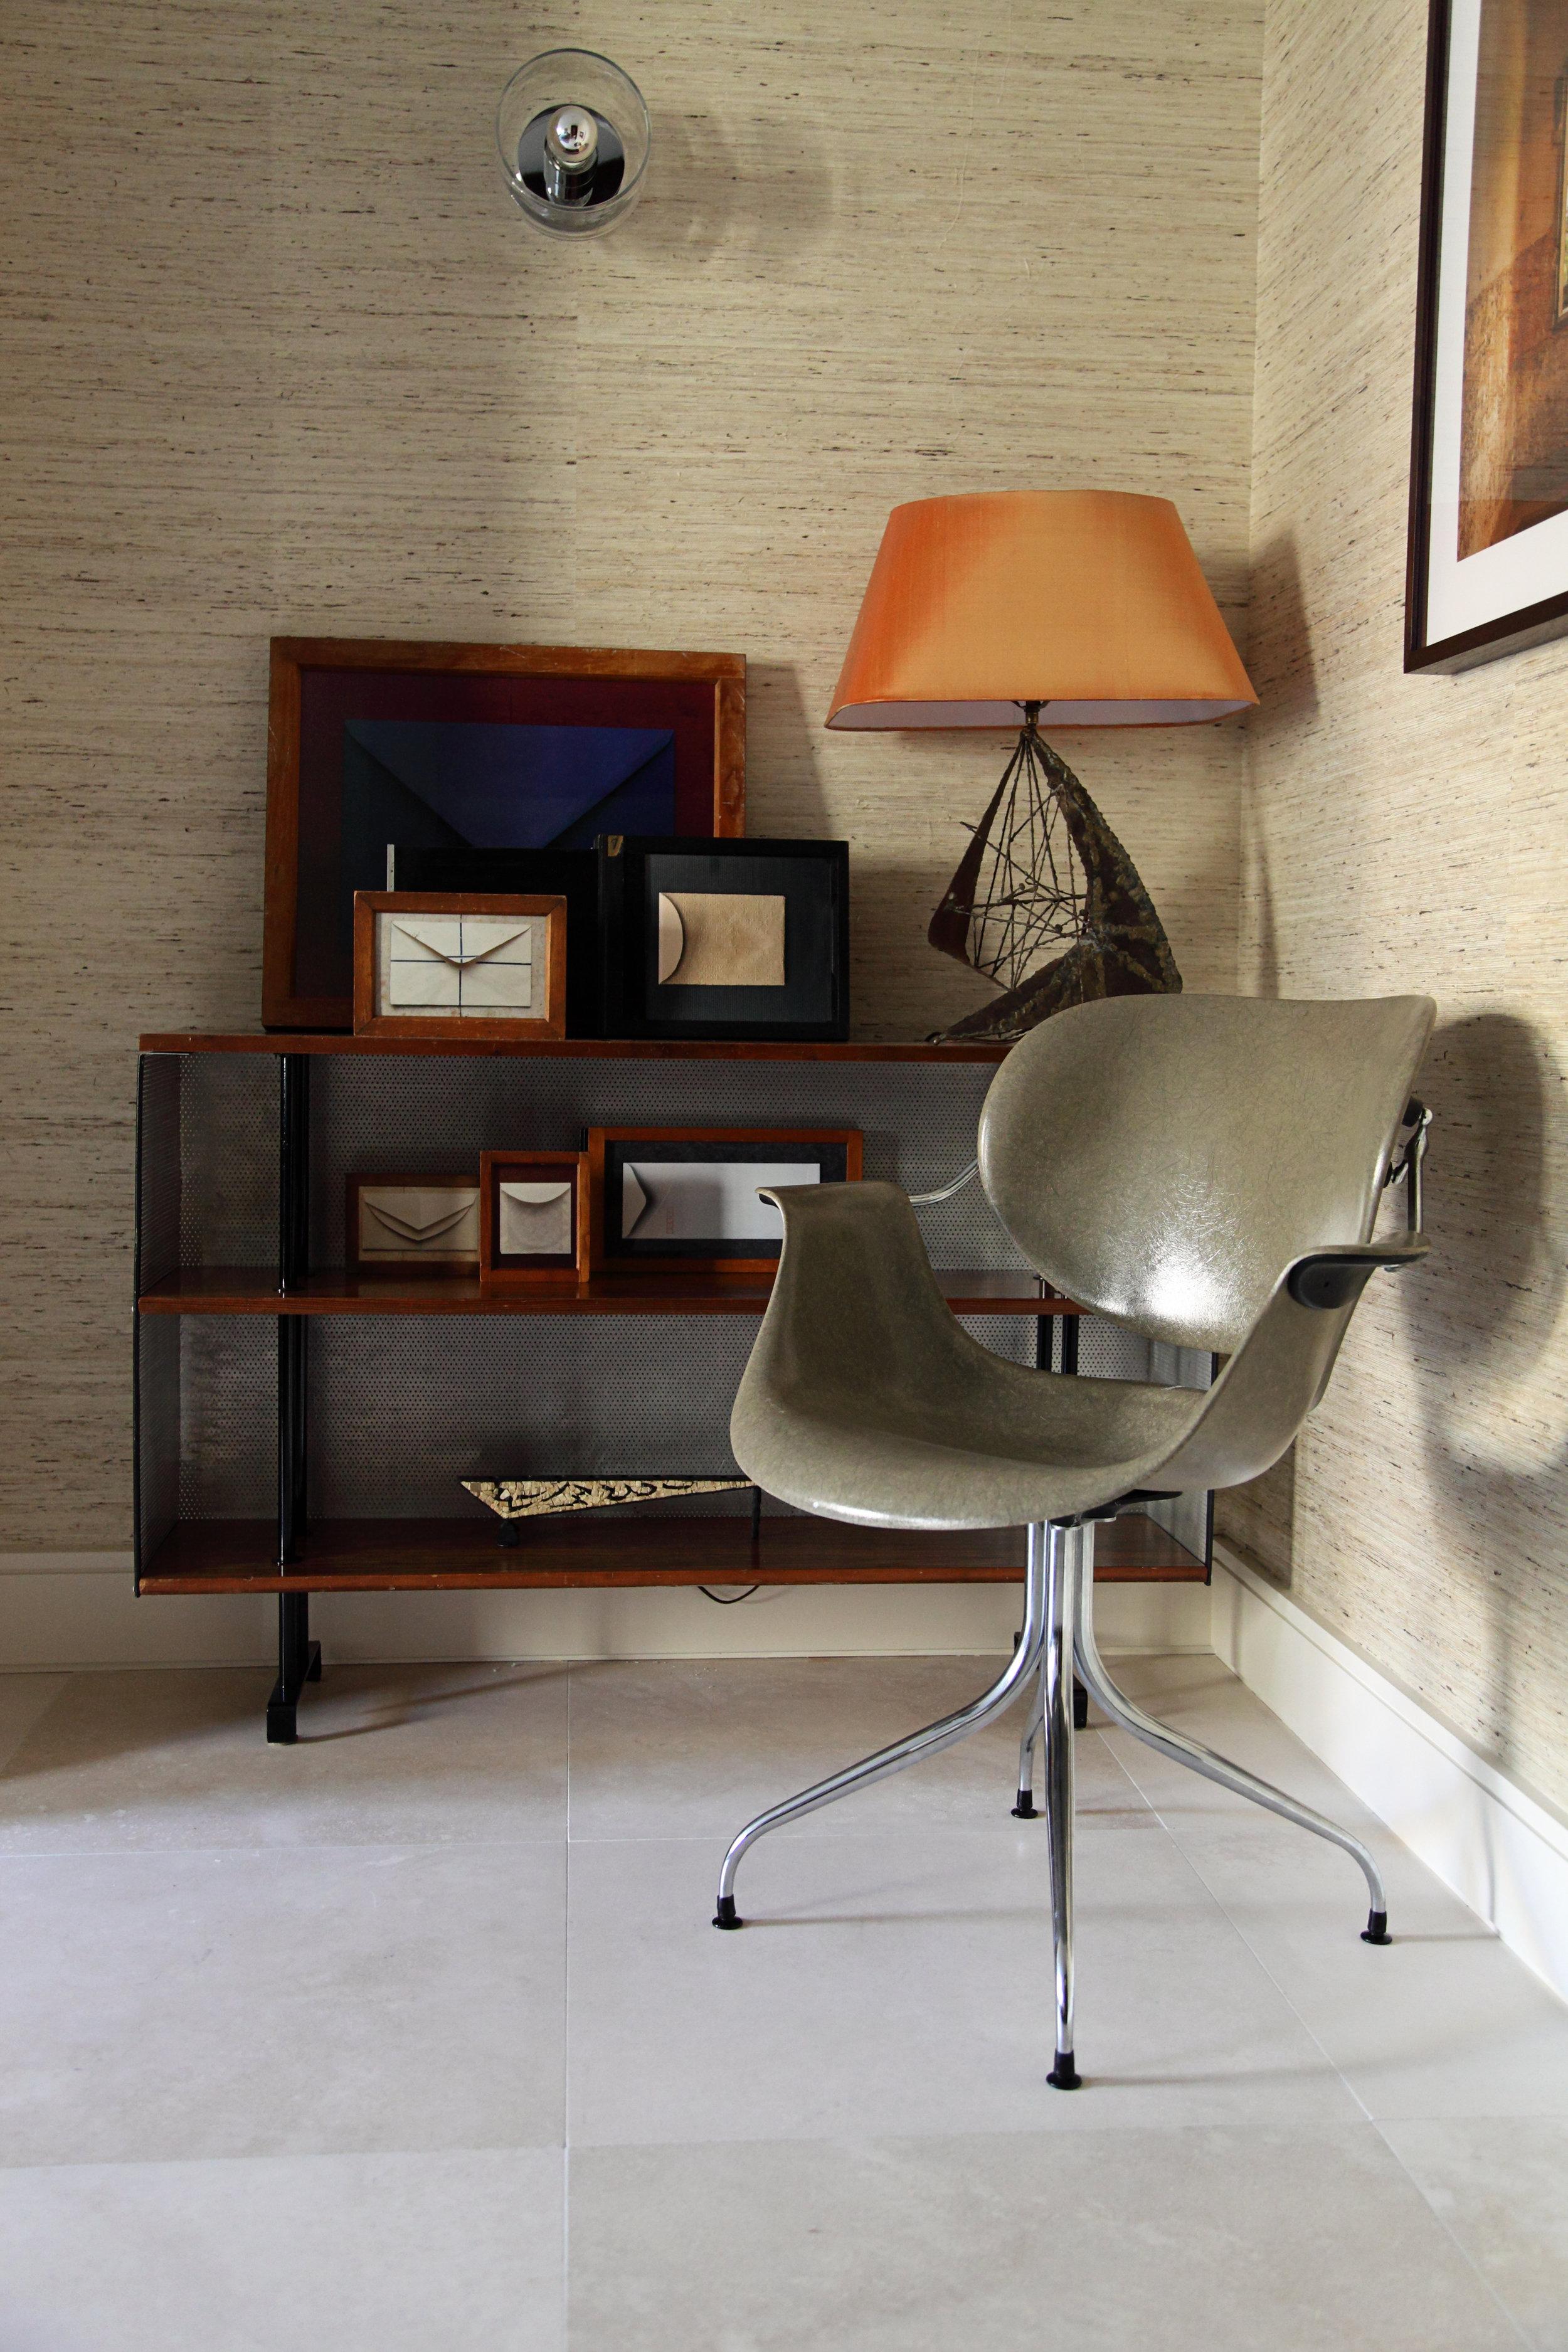 ATI - EB Office Chair Vignette.jpg